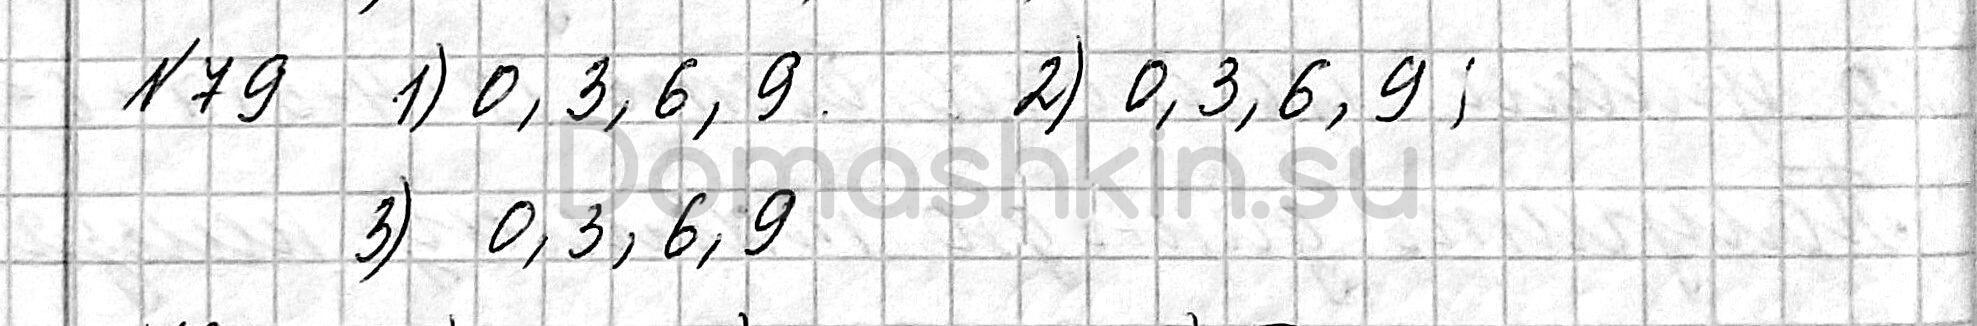 Математика 6 класс учебник Мерзляк номер 79 решение